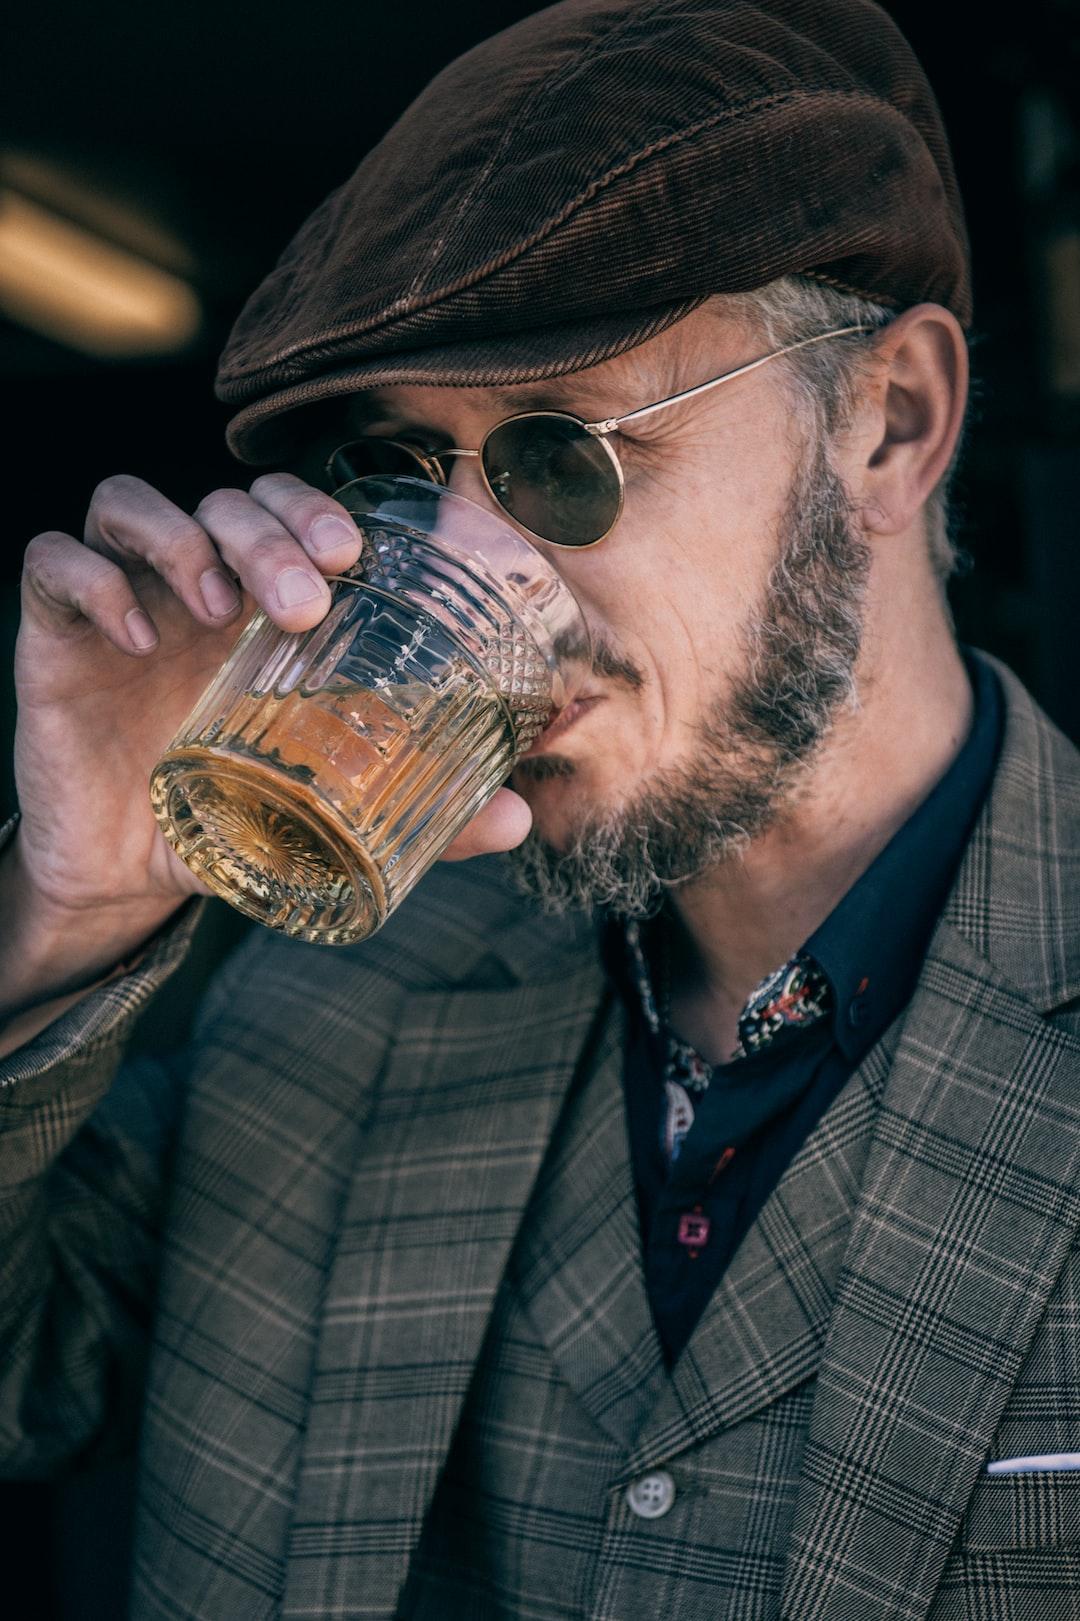 Owner of Gentlemen's Breakfast, Van de la Plante. Drop in for custom vintage eyewear and enjoy free scotch and cigars.